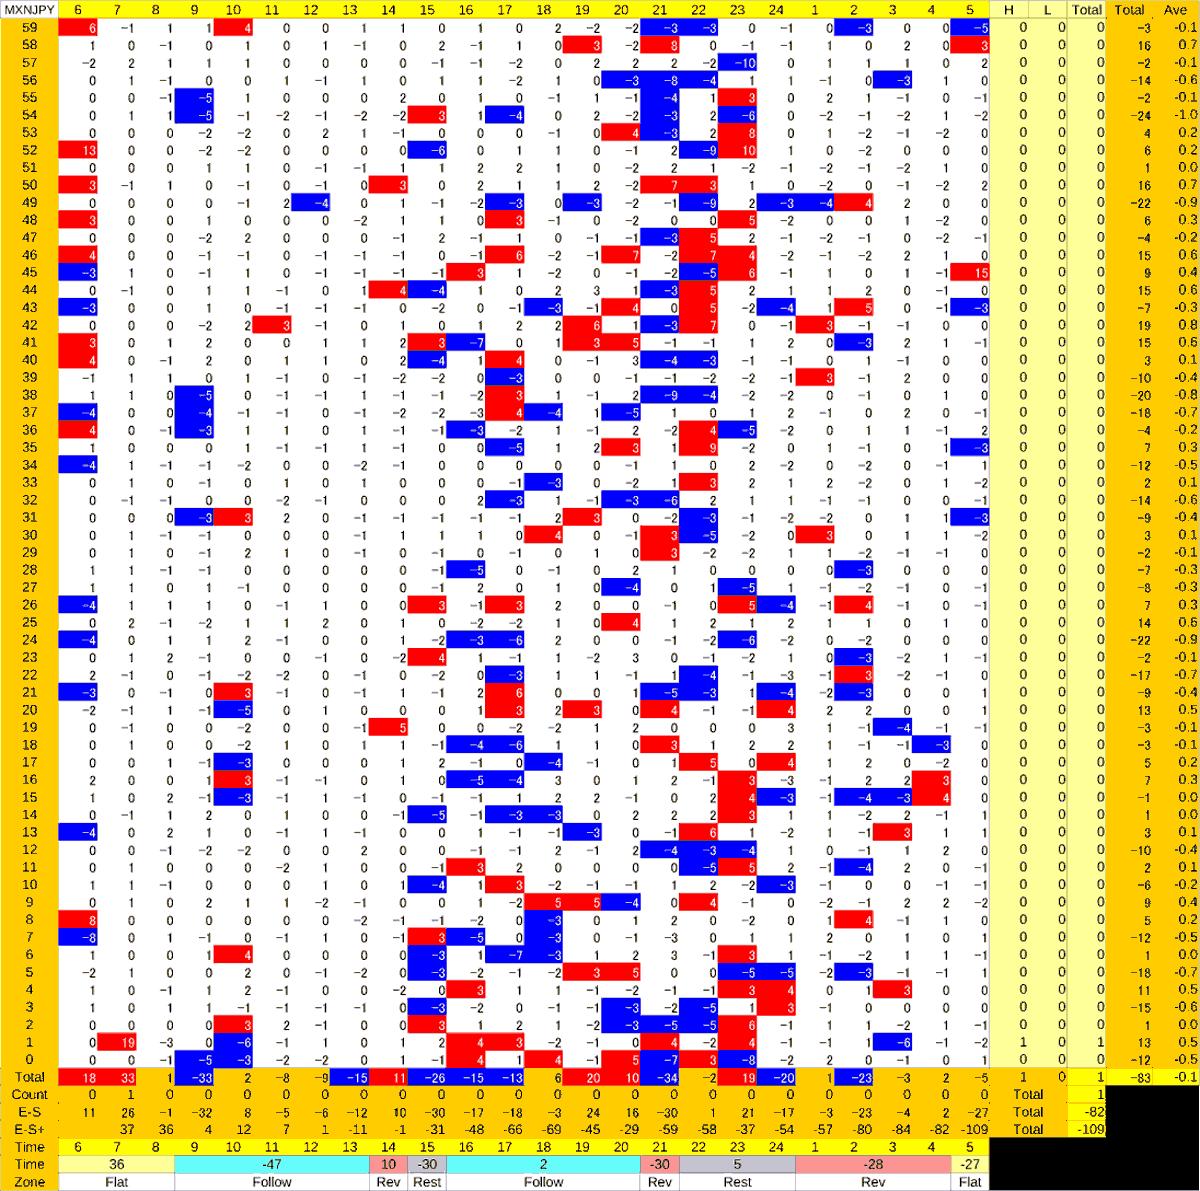 20200609_HS(3)MXNJPY